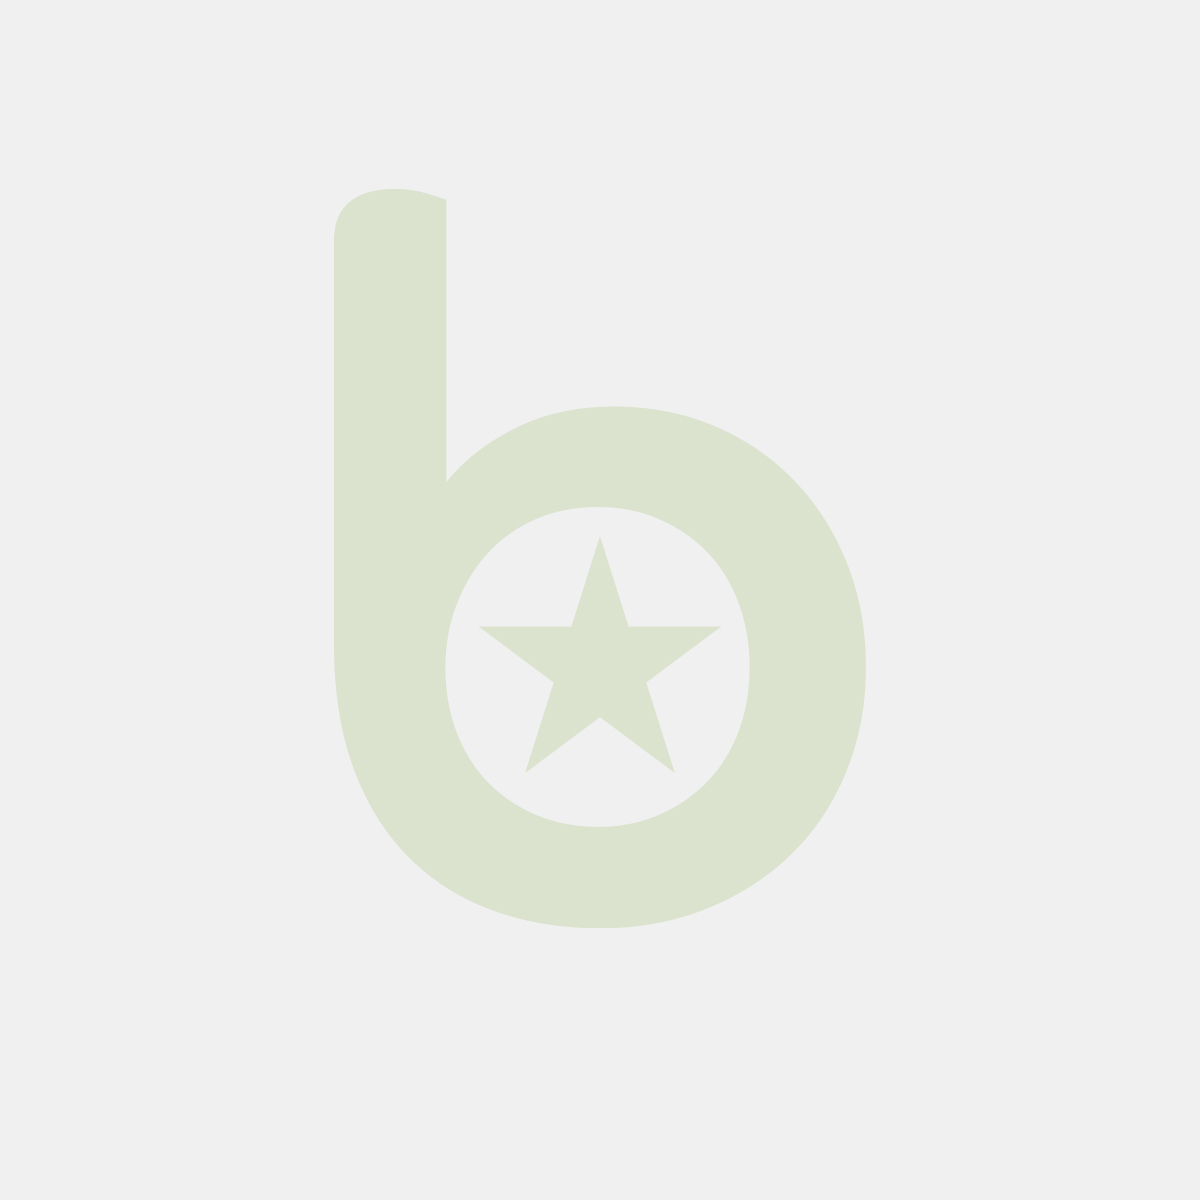 BC012 Przycisk alarmowy 100x100mm płyta sztywna TOPlight S-tandard